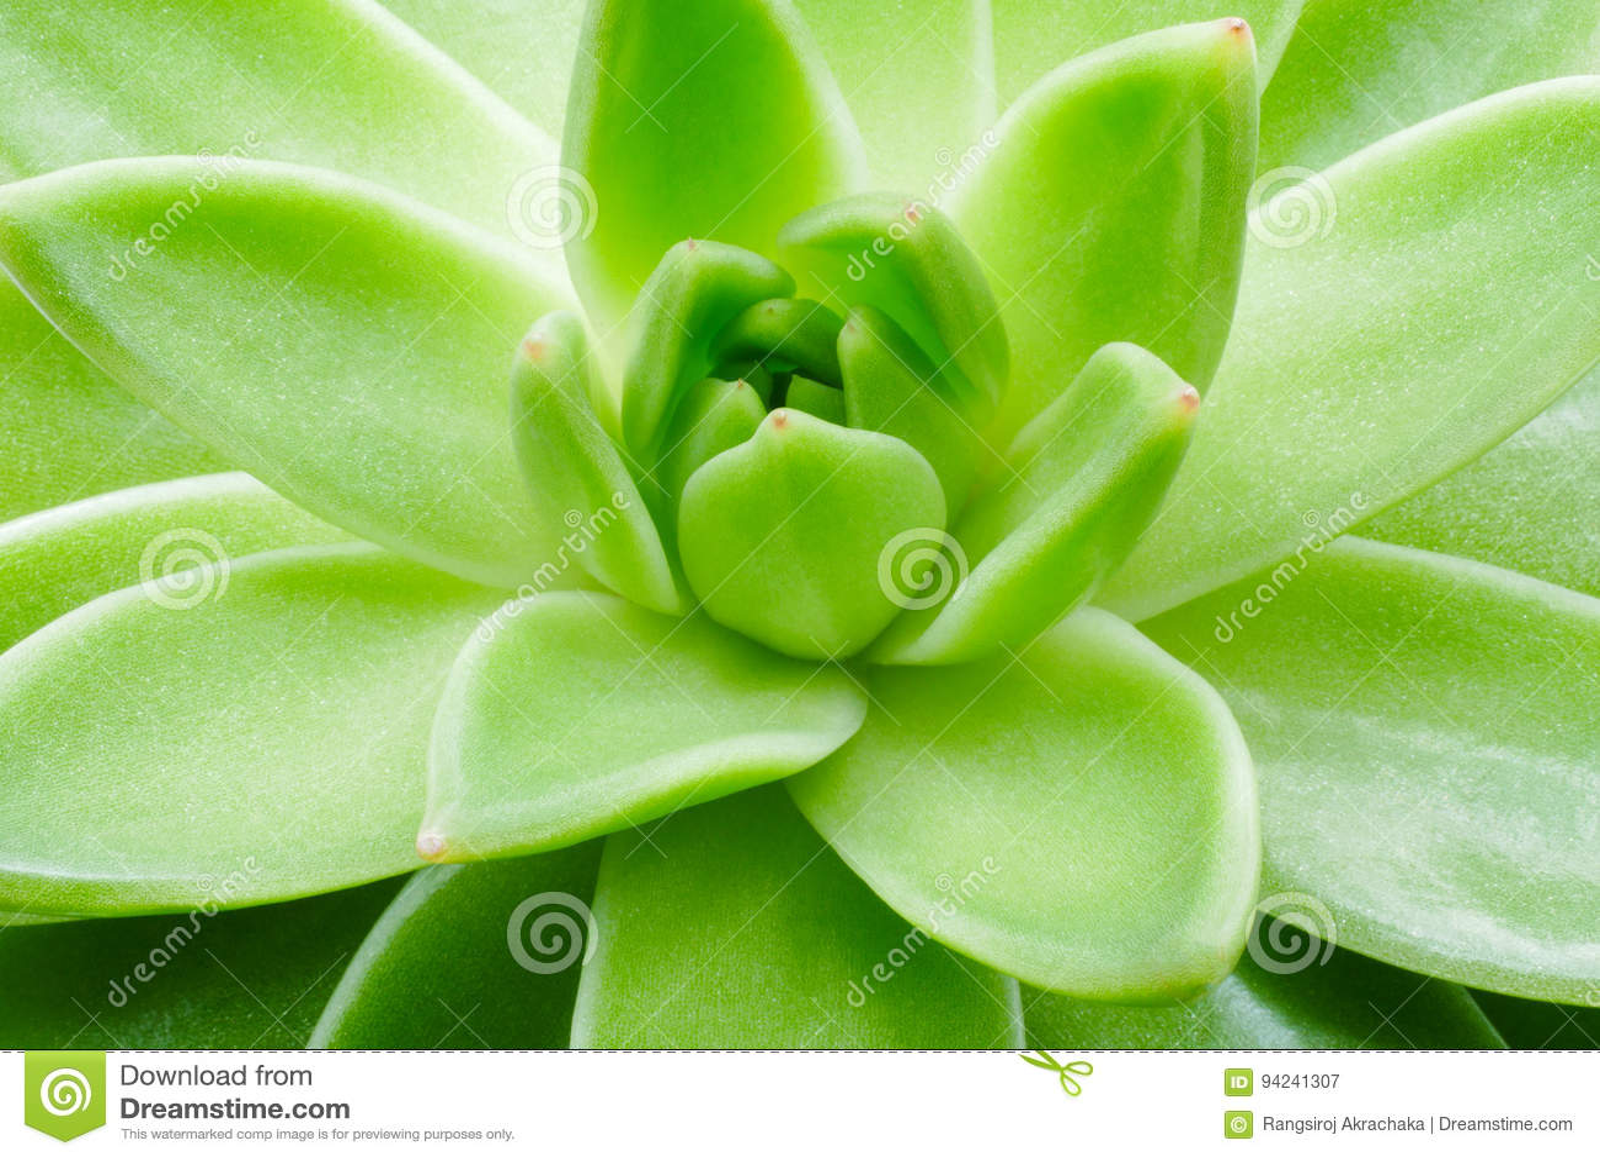 Groene succulente installatie macro dichte omhooggaande achtergrond